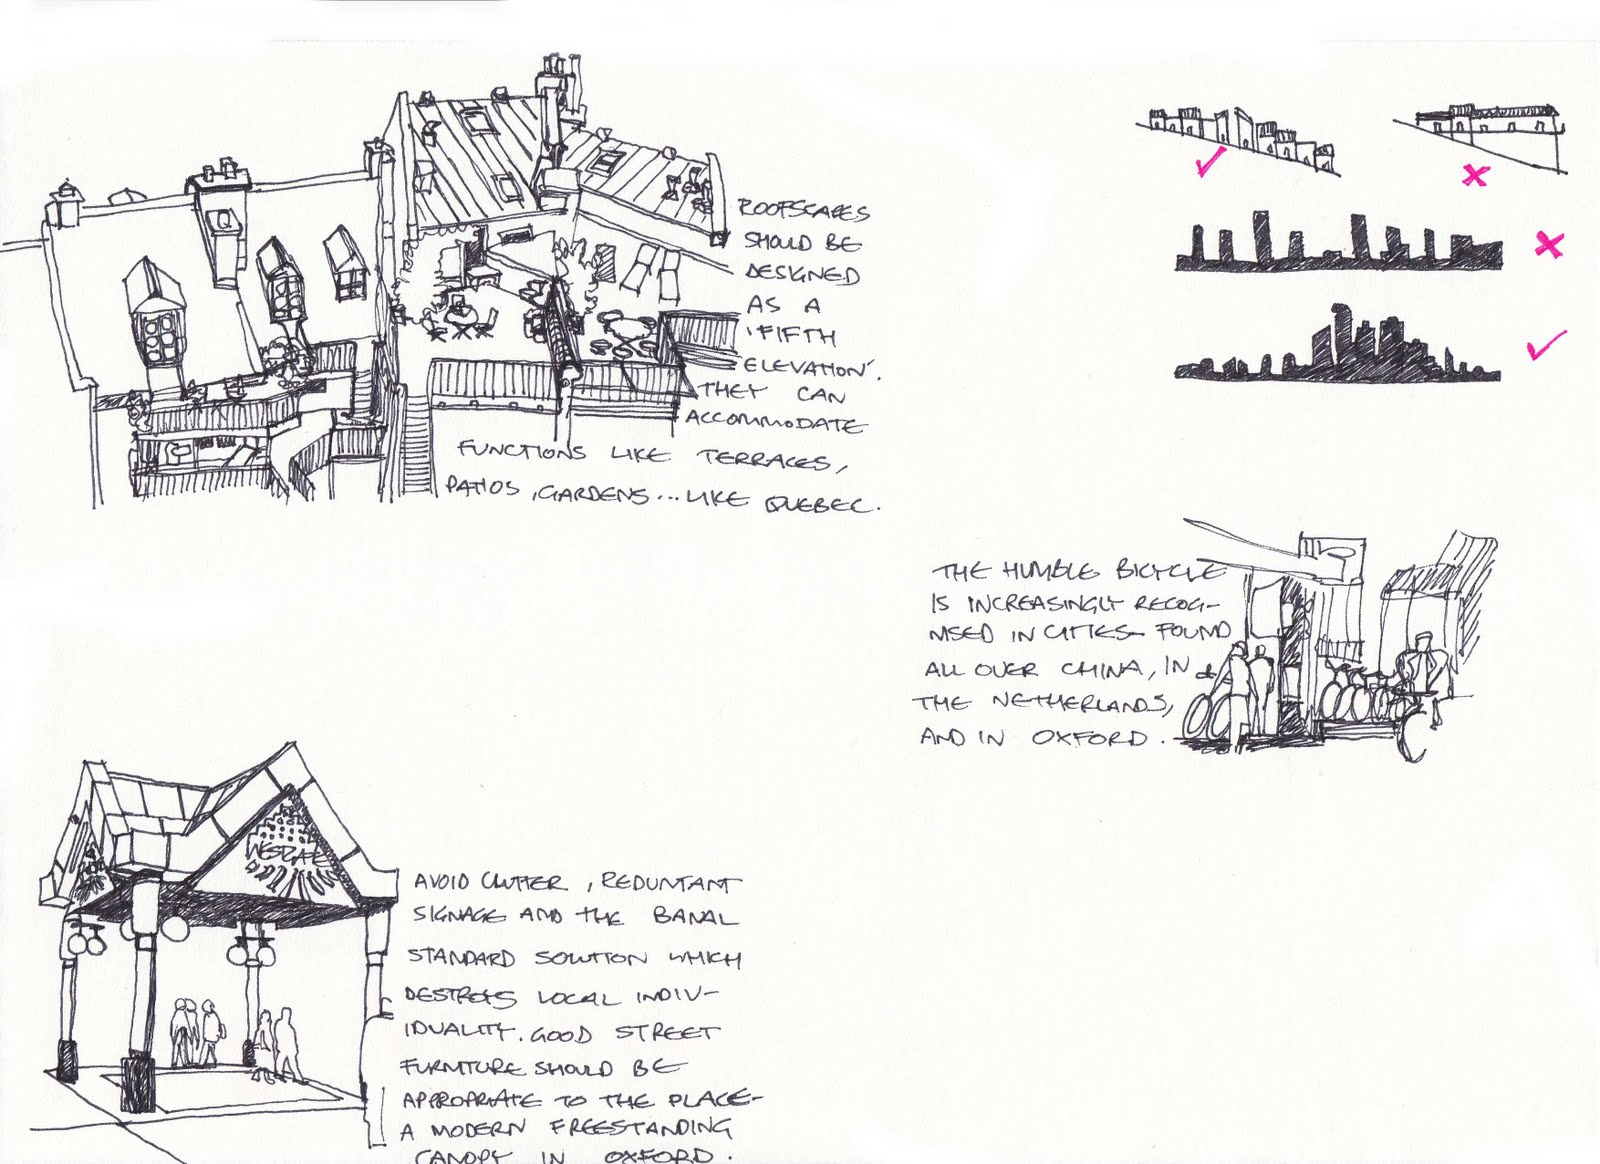 Architecture4resolution Public Urban Environment Principles